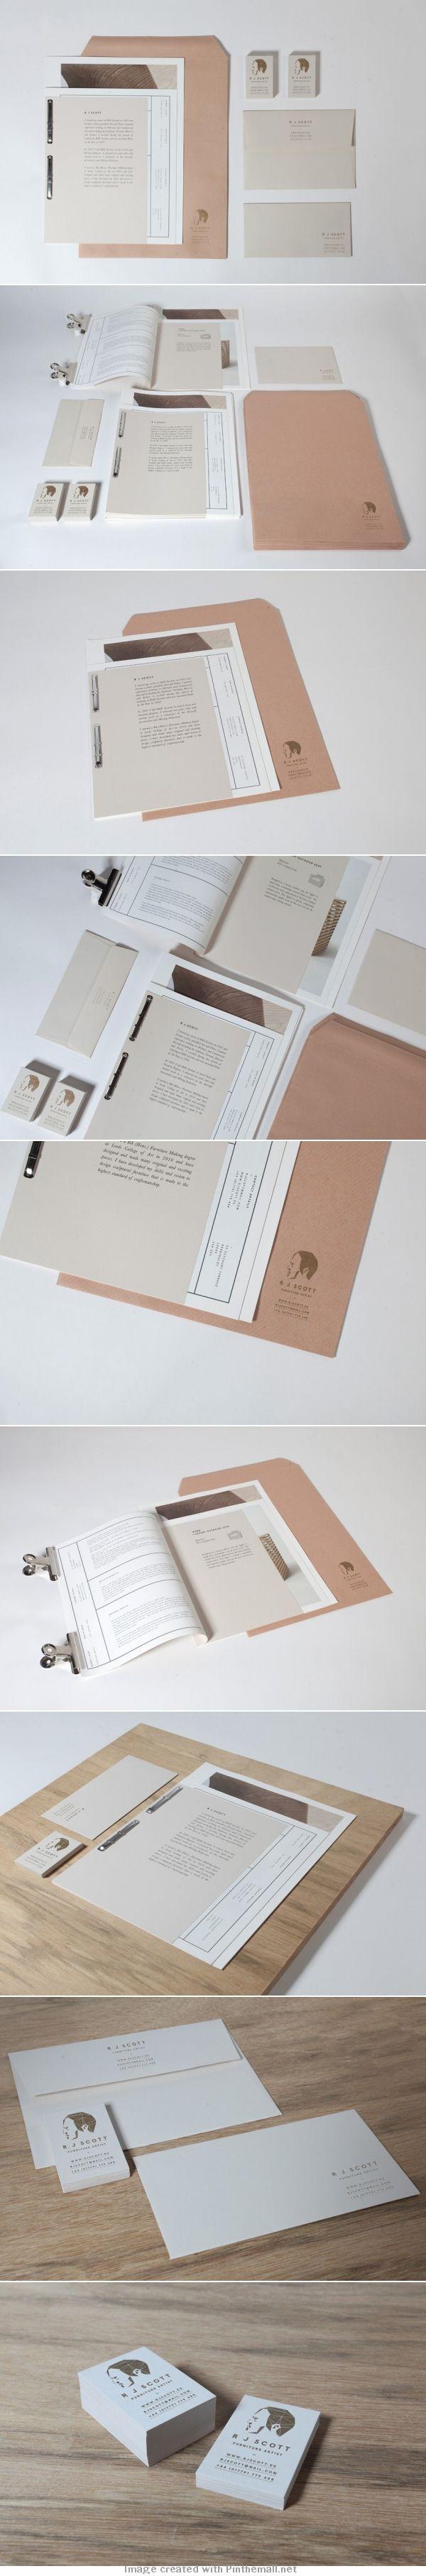 Corporate design letterhead letter business card logo envelop colors graphic minimal stamp binder paper